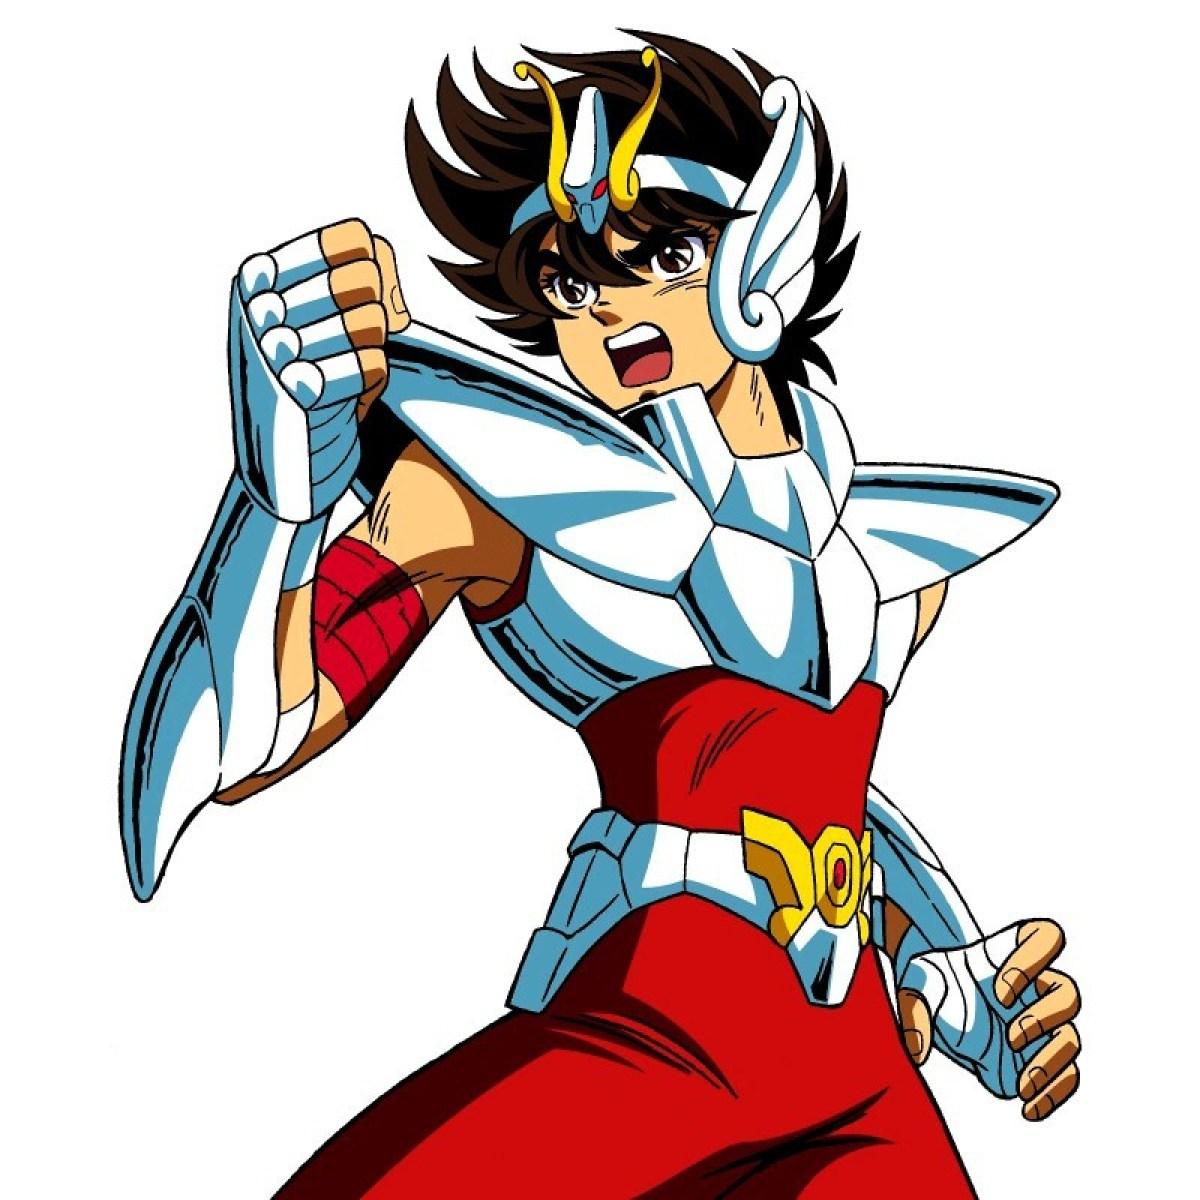 Manual de como montar um protagonista shounen - saint seya cavaleiros anime 7